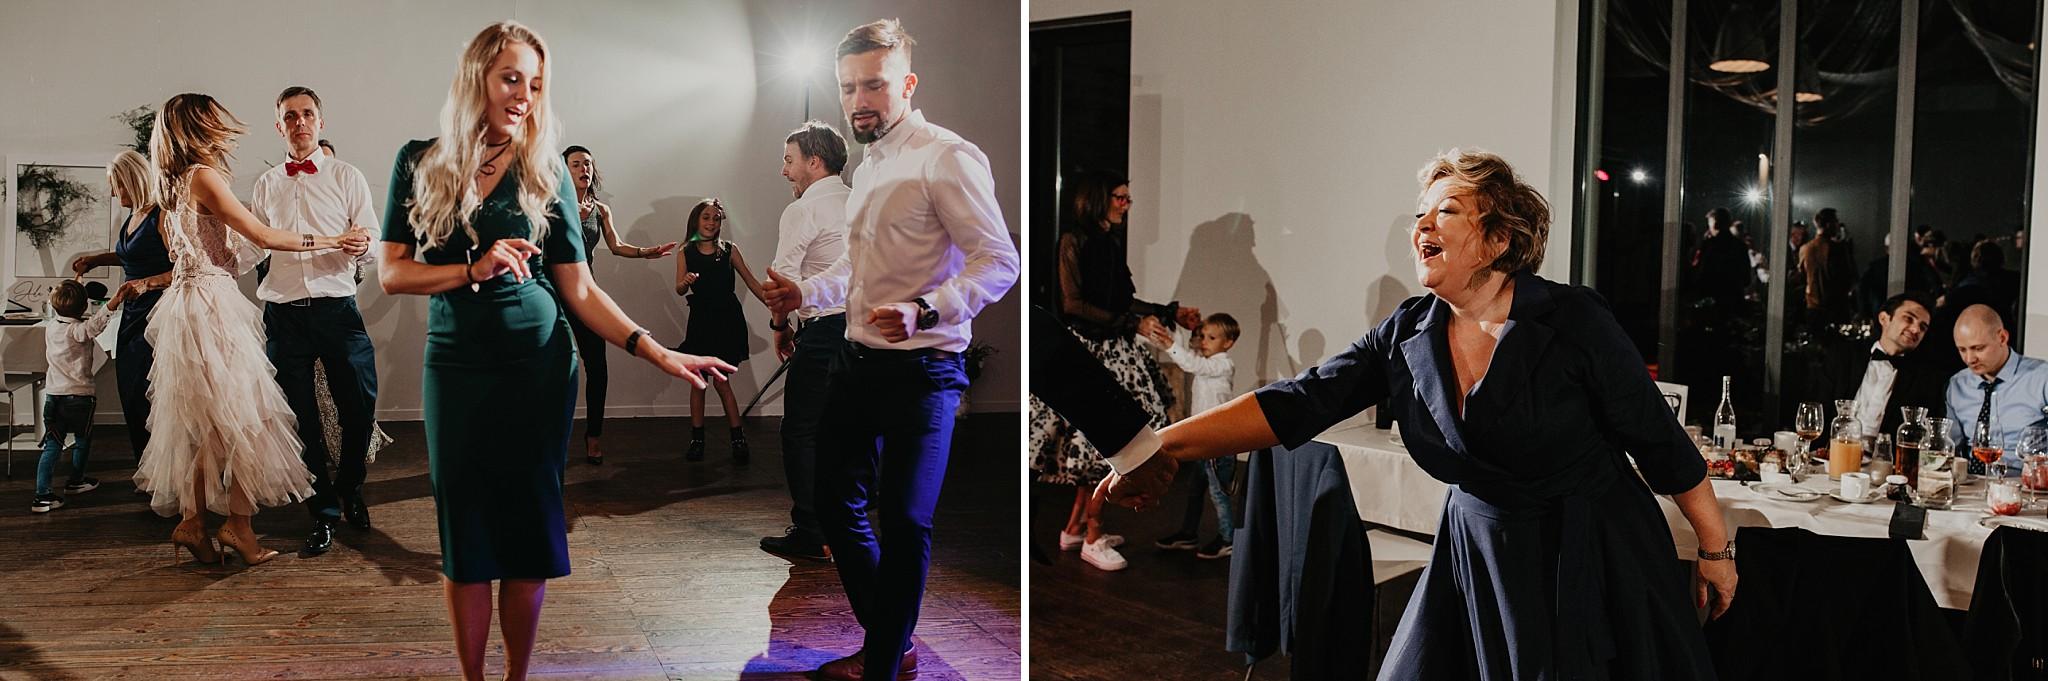 fotograf poznan wesele dobra truskawka piekne wesele pod poznaniem wesele w dobrej truskawce piekna para mloda slub marzen slub koronawirus slub listopad wesele koronawirus 417